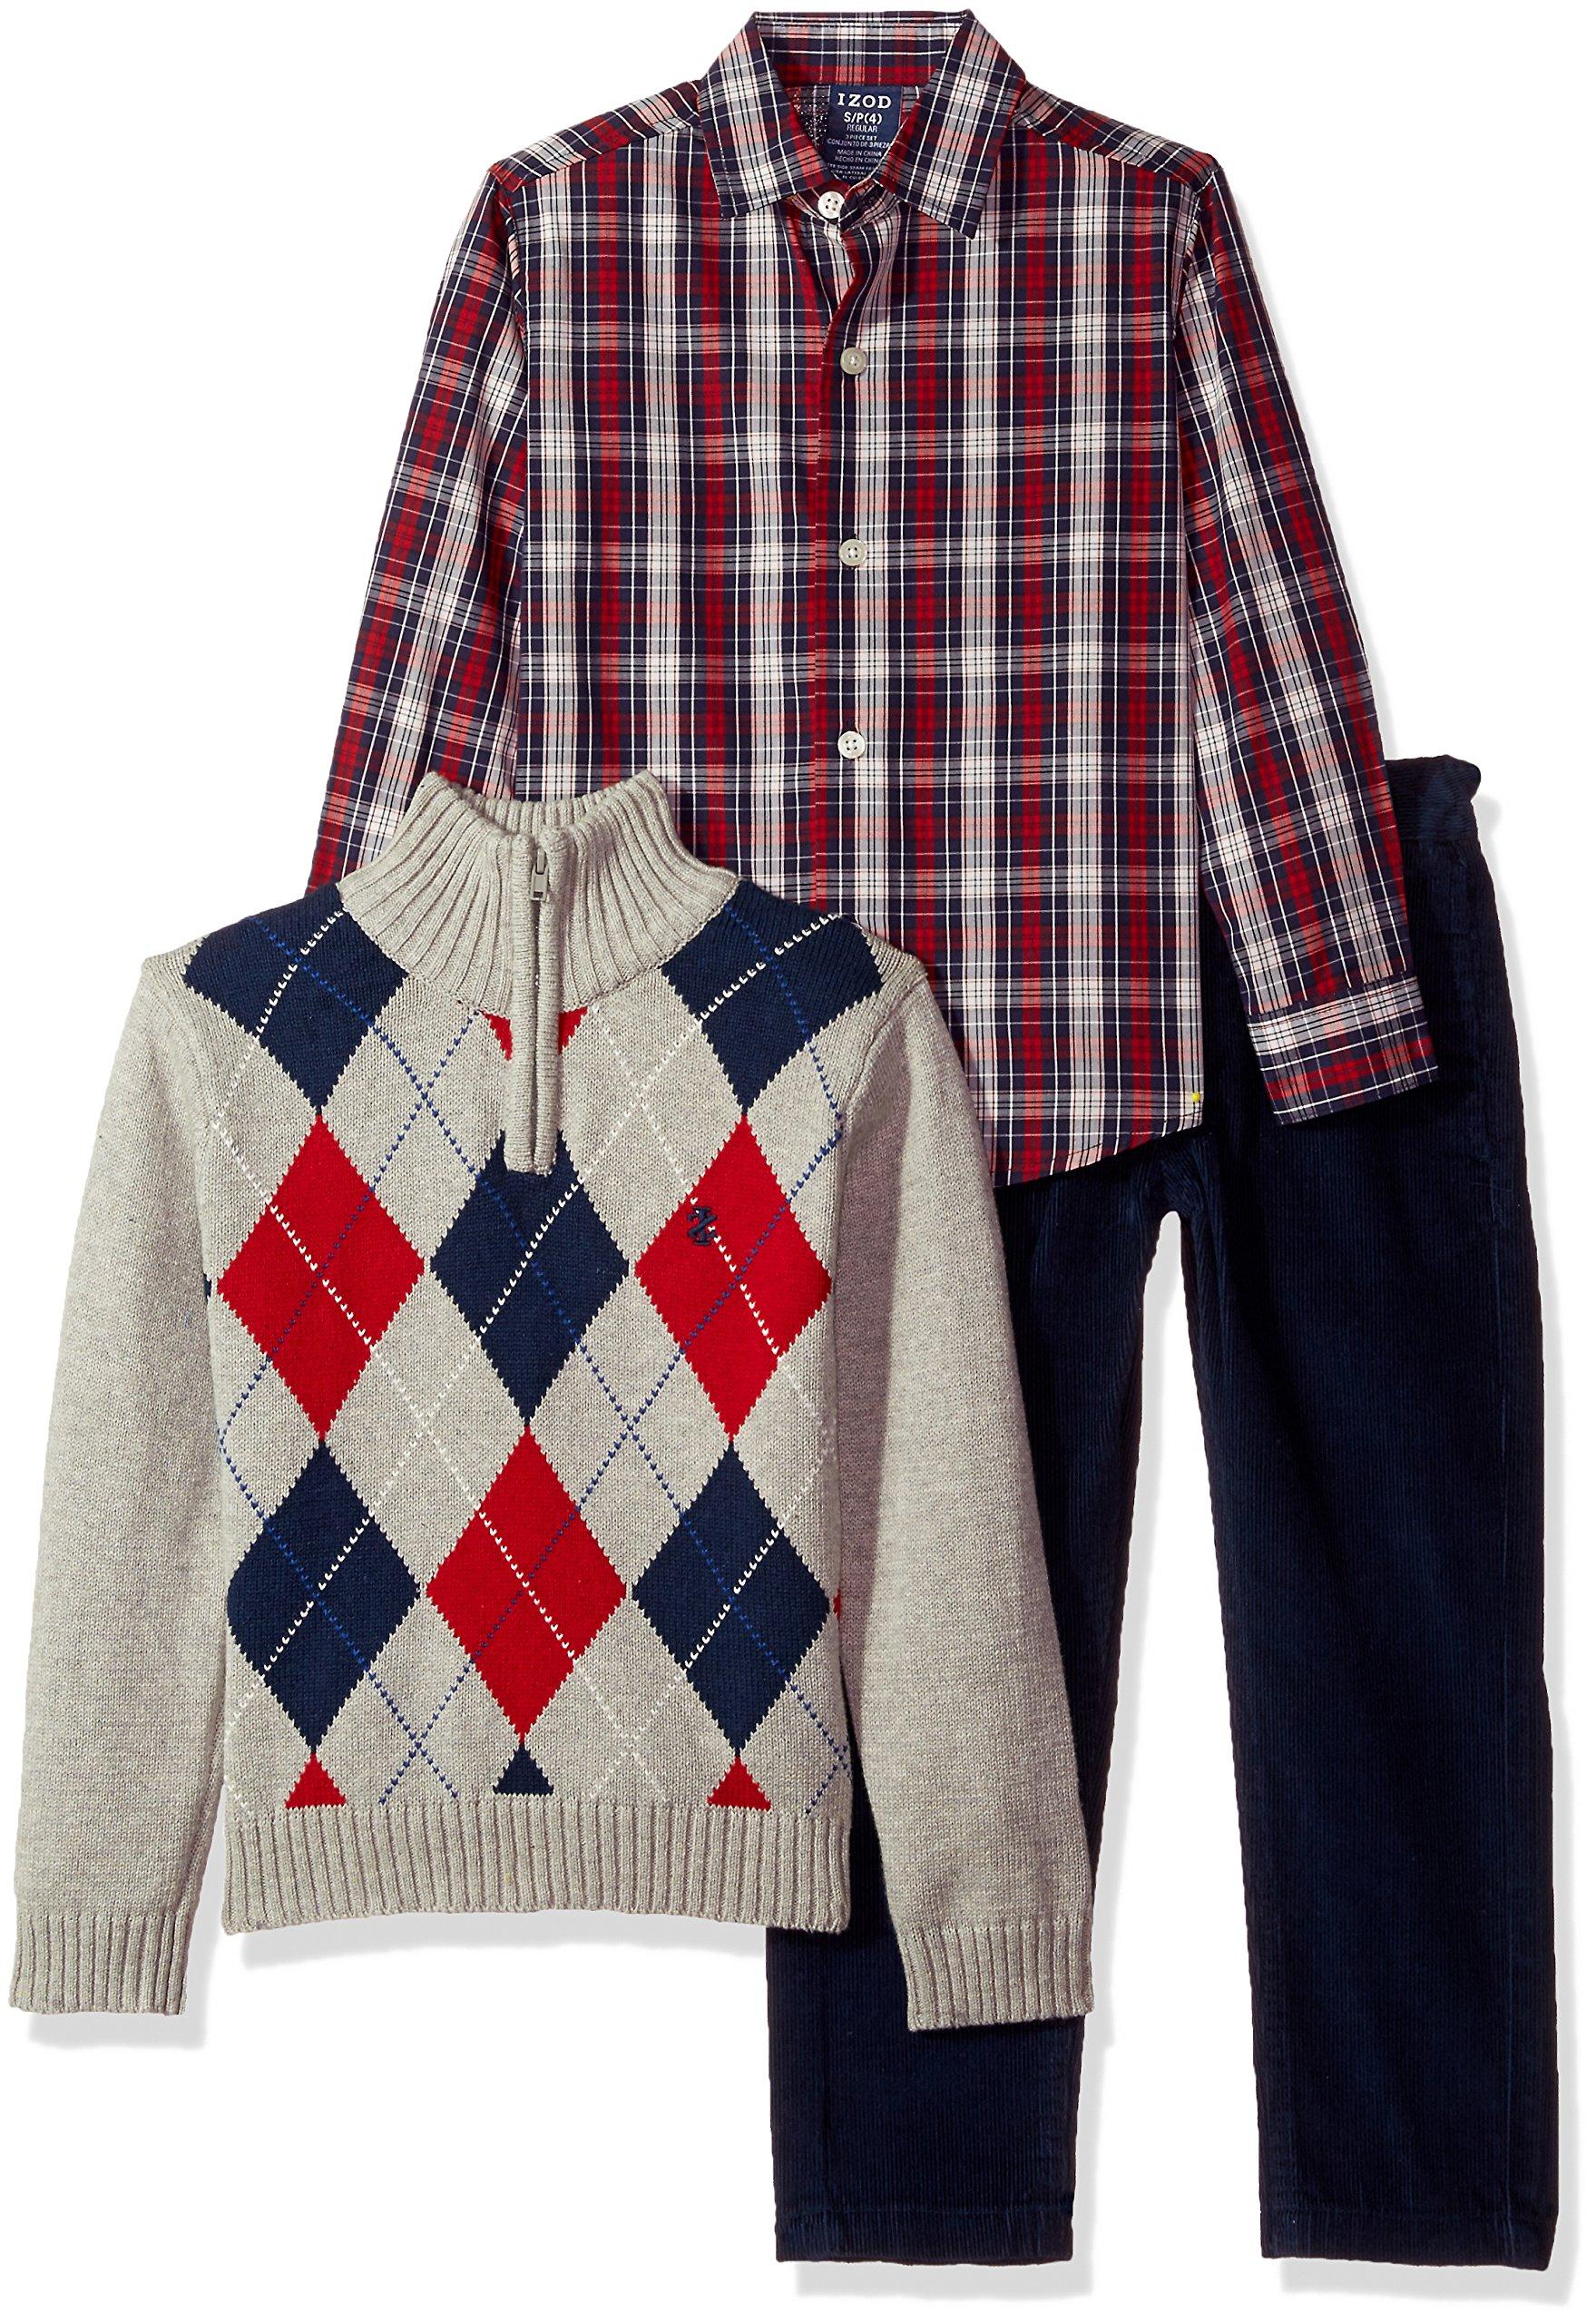 Izod boys 3-Piece Sweater, Dress Shirt, and Pants Set,grey heather,2T